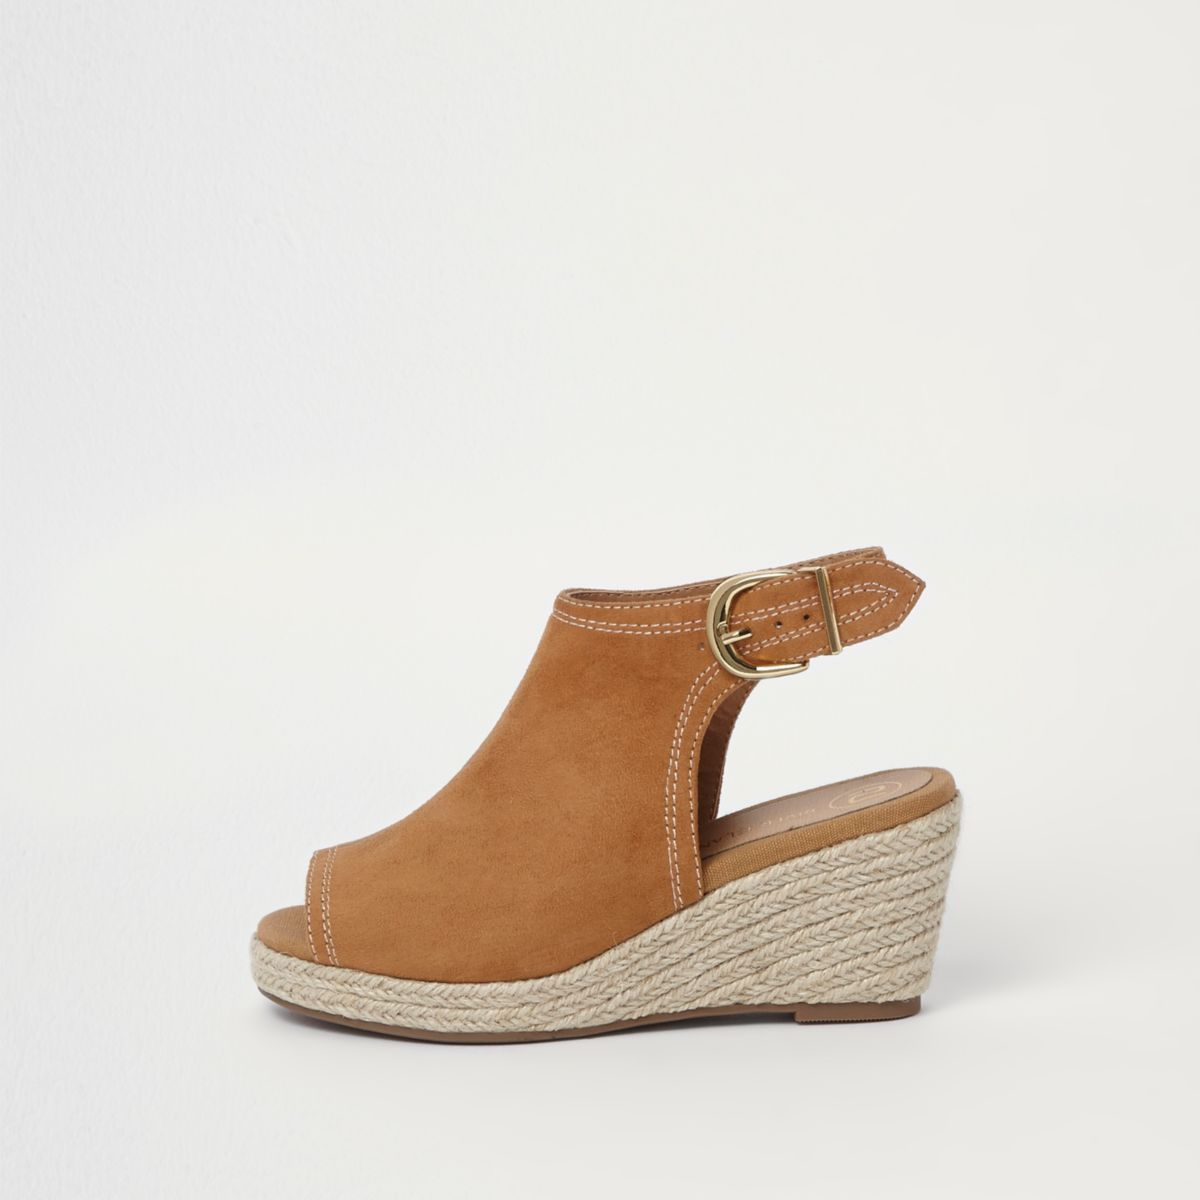 Girls tan espadrille wedge shoe boots